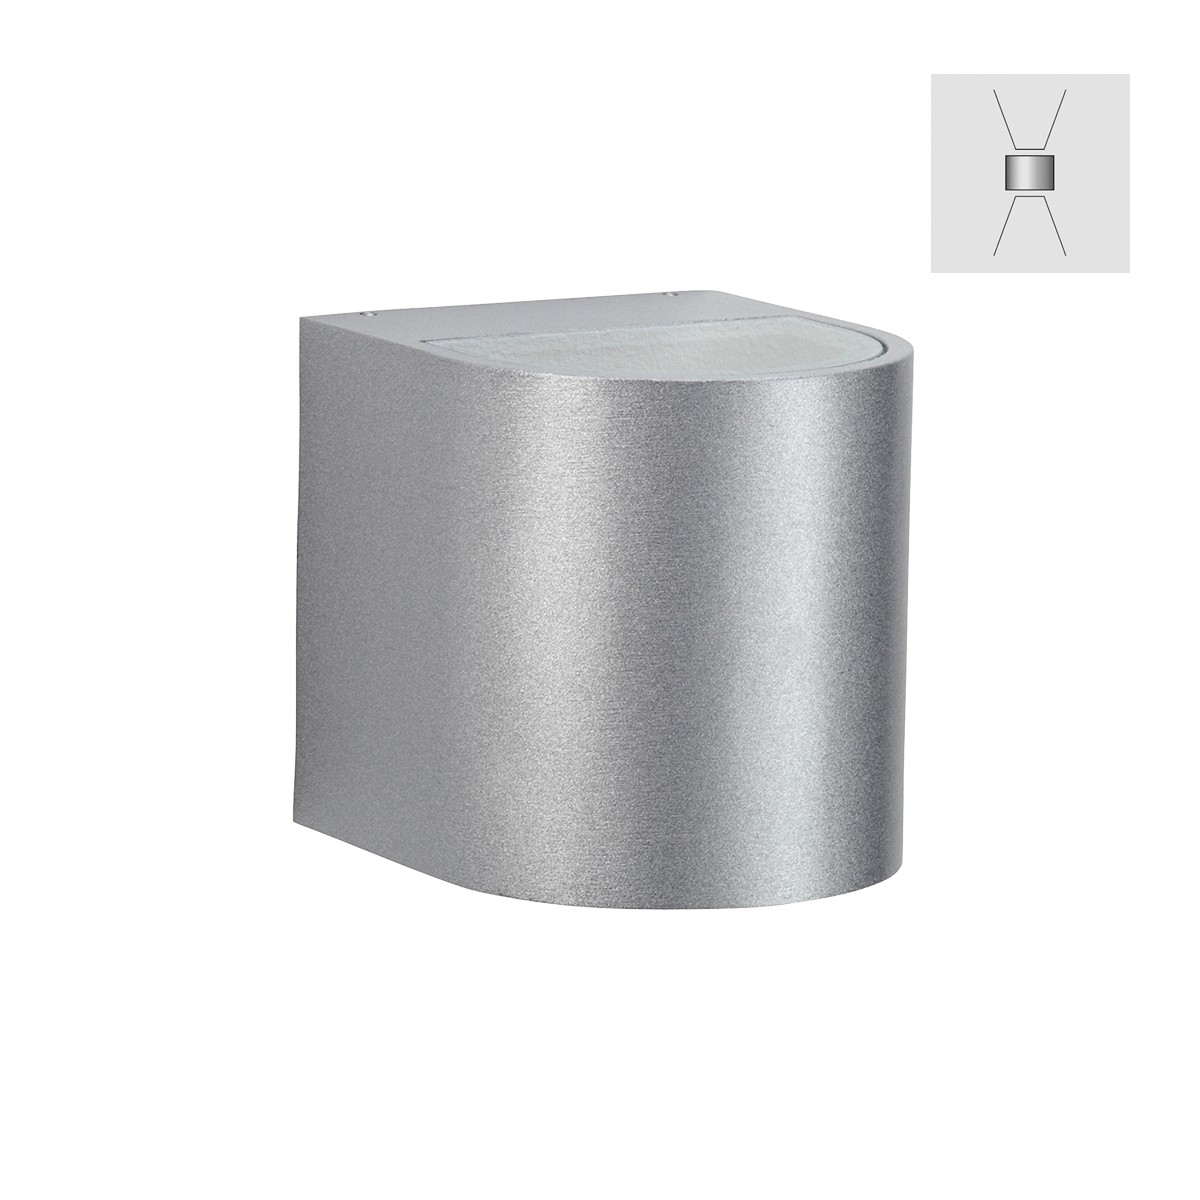 Albert 2402 Wandstrahler, breit/breit, Silber